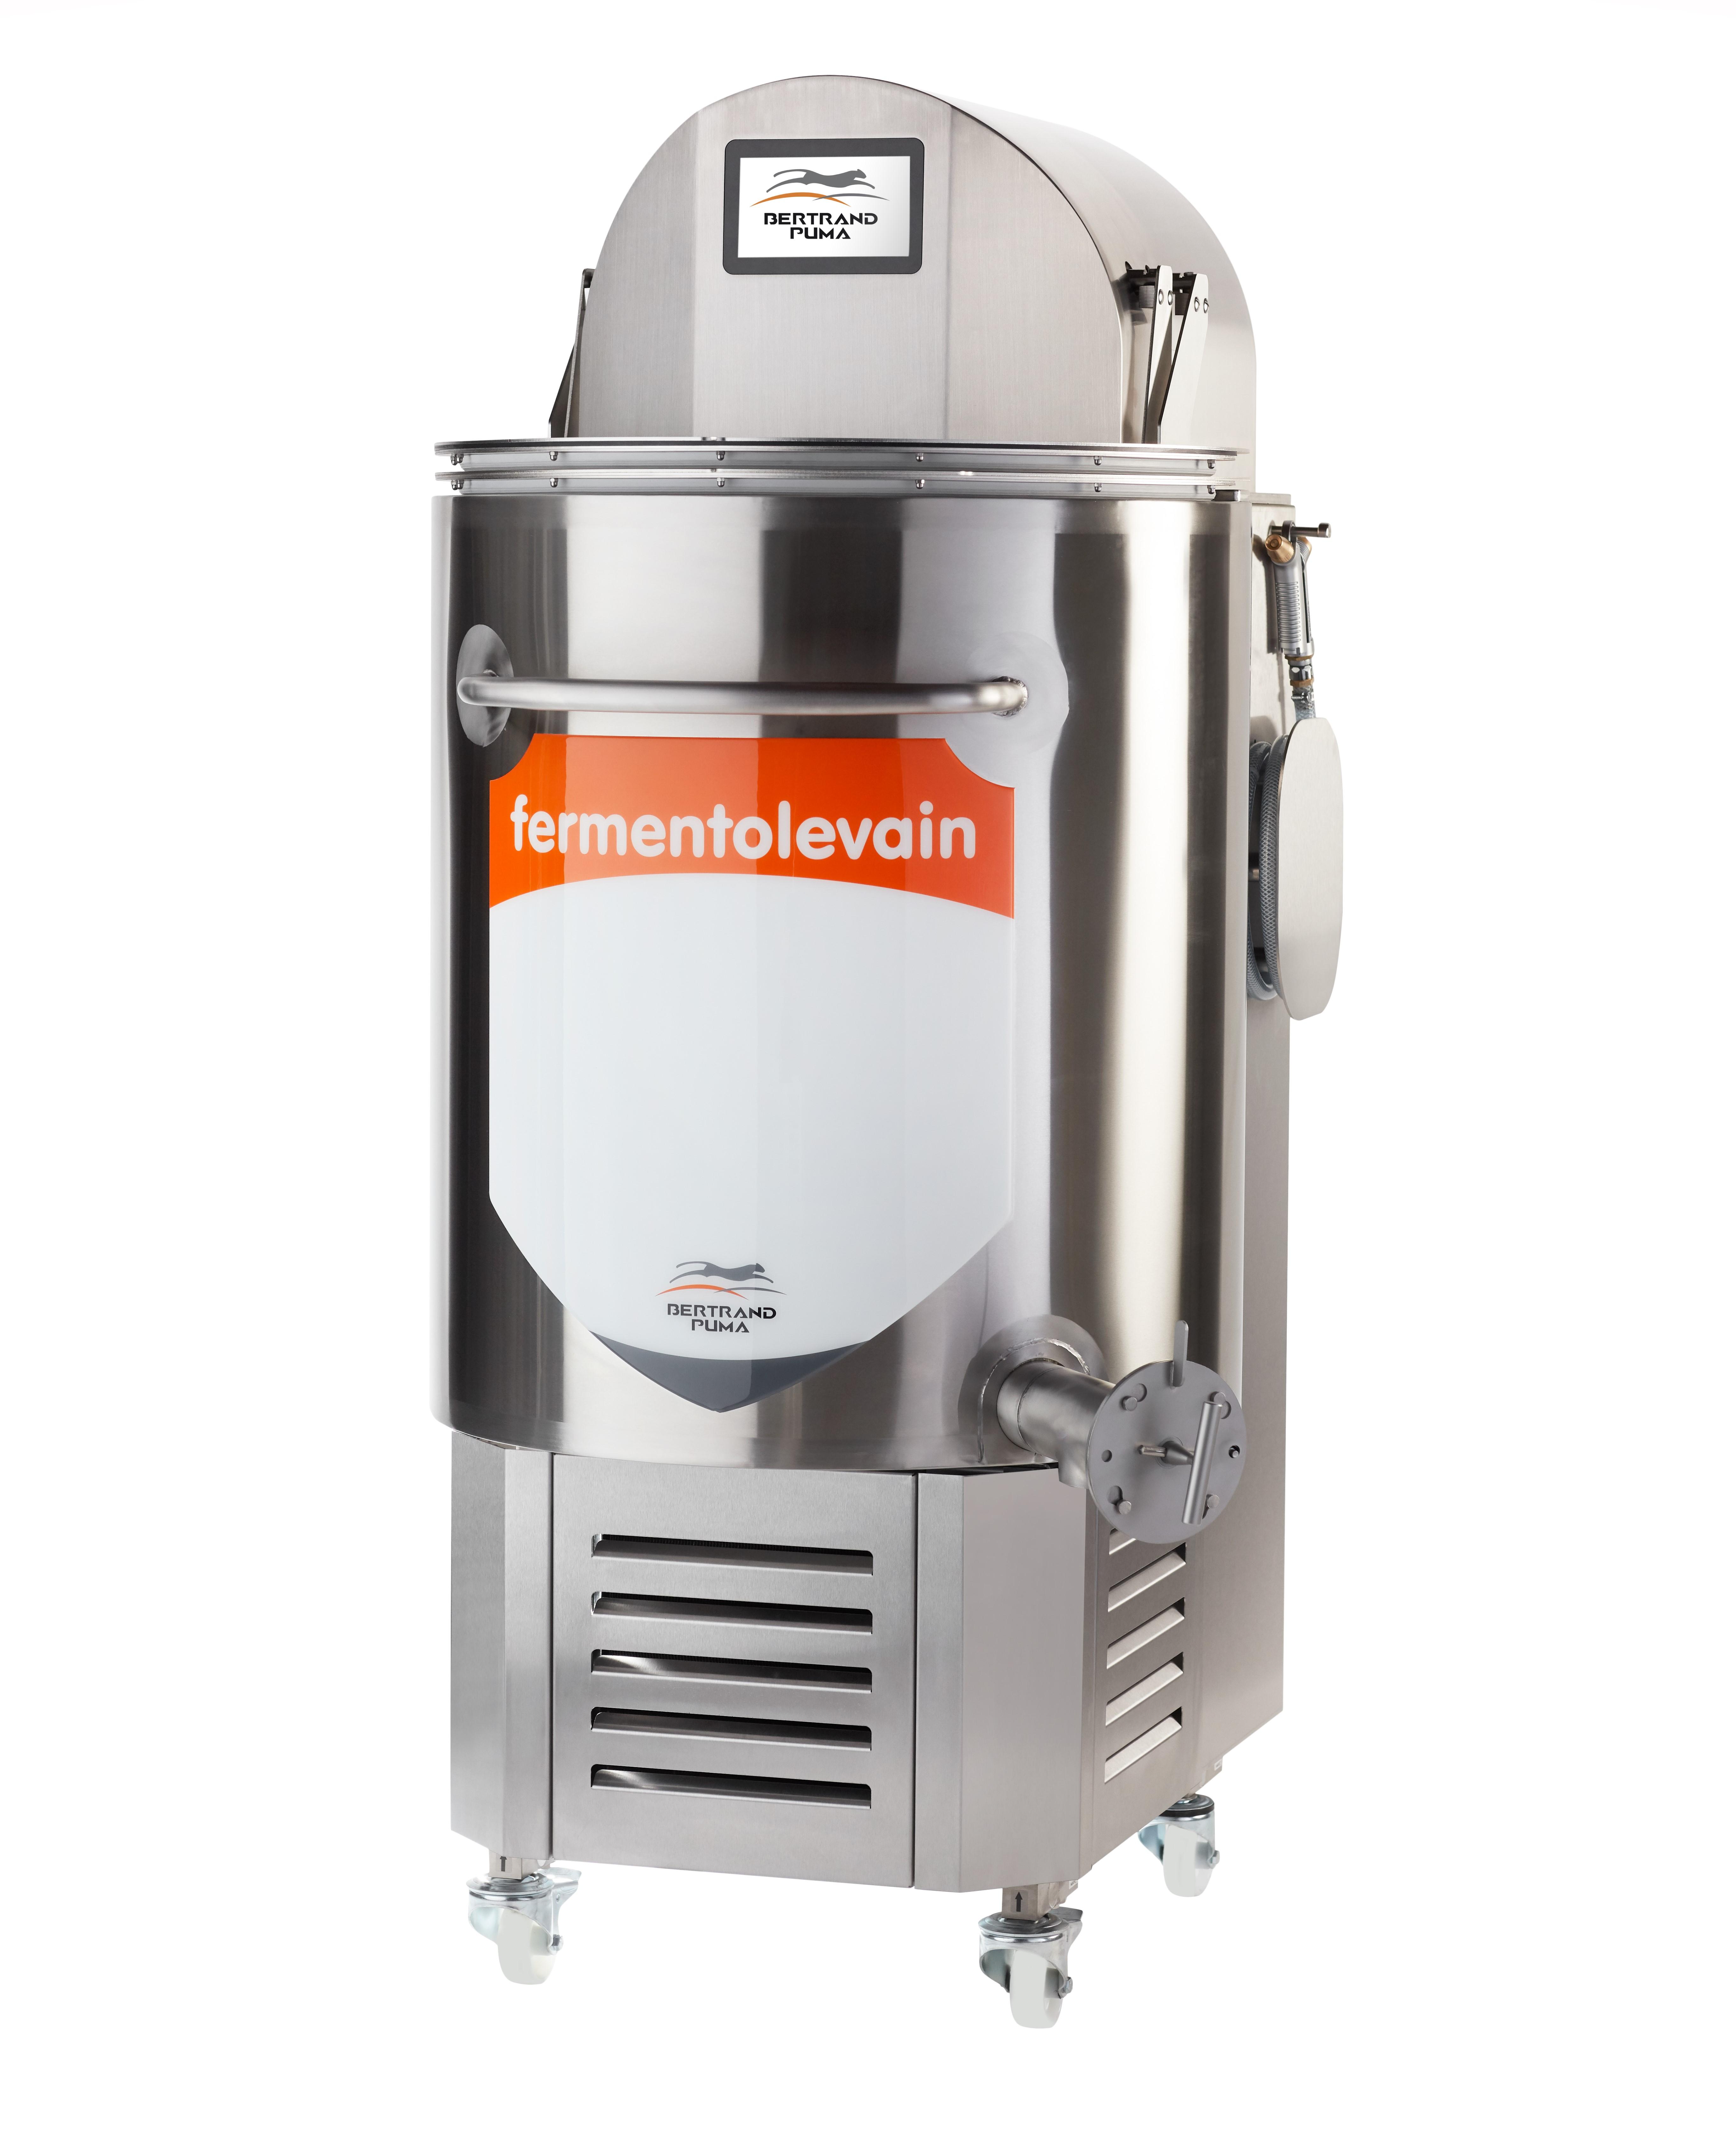 Bertrand- Puma fermentolevain FL100